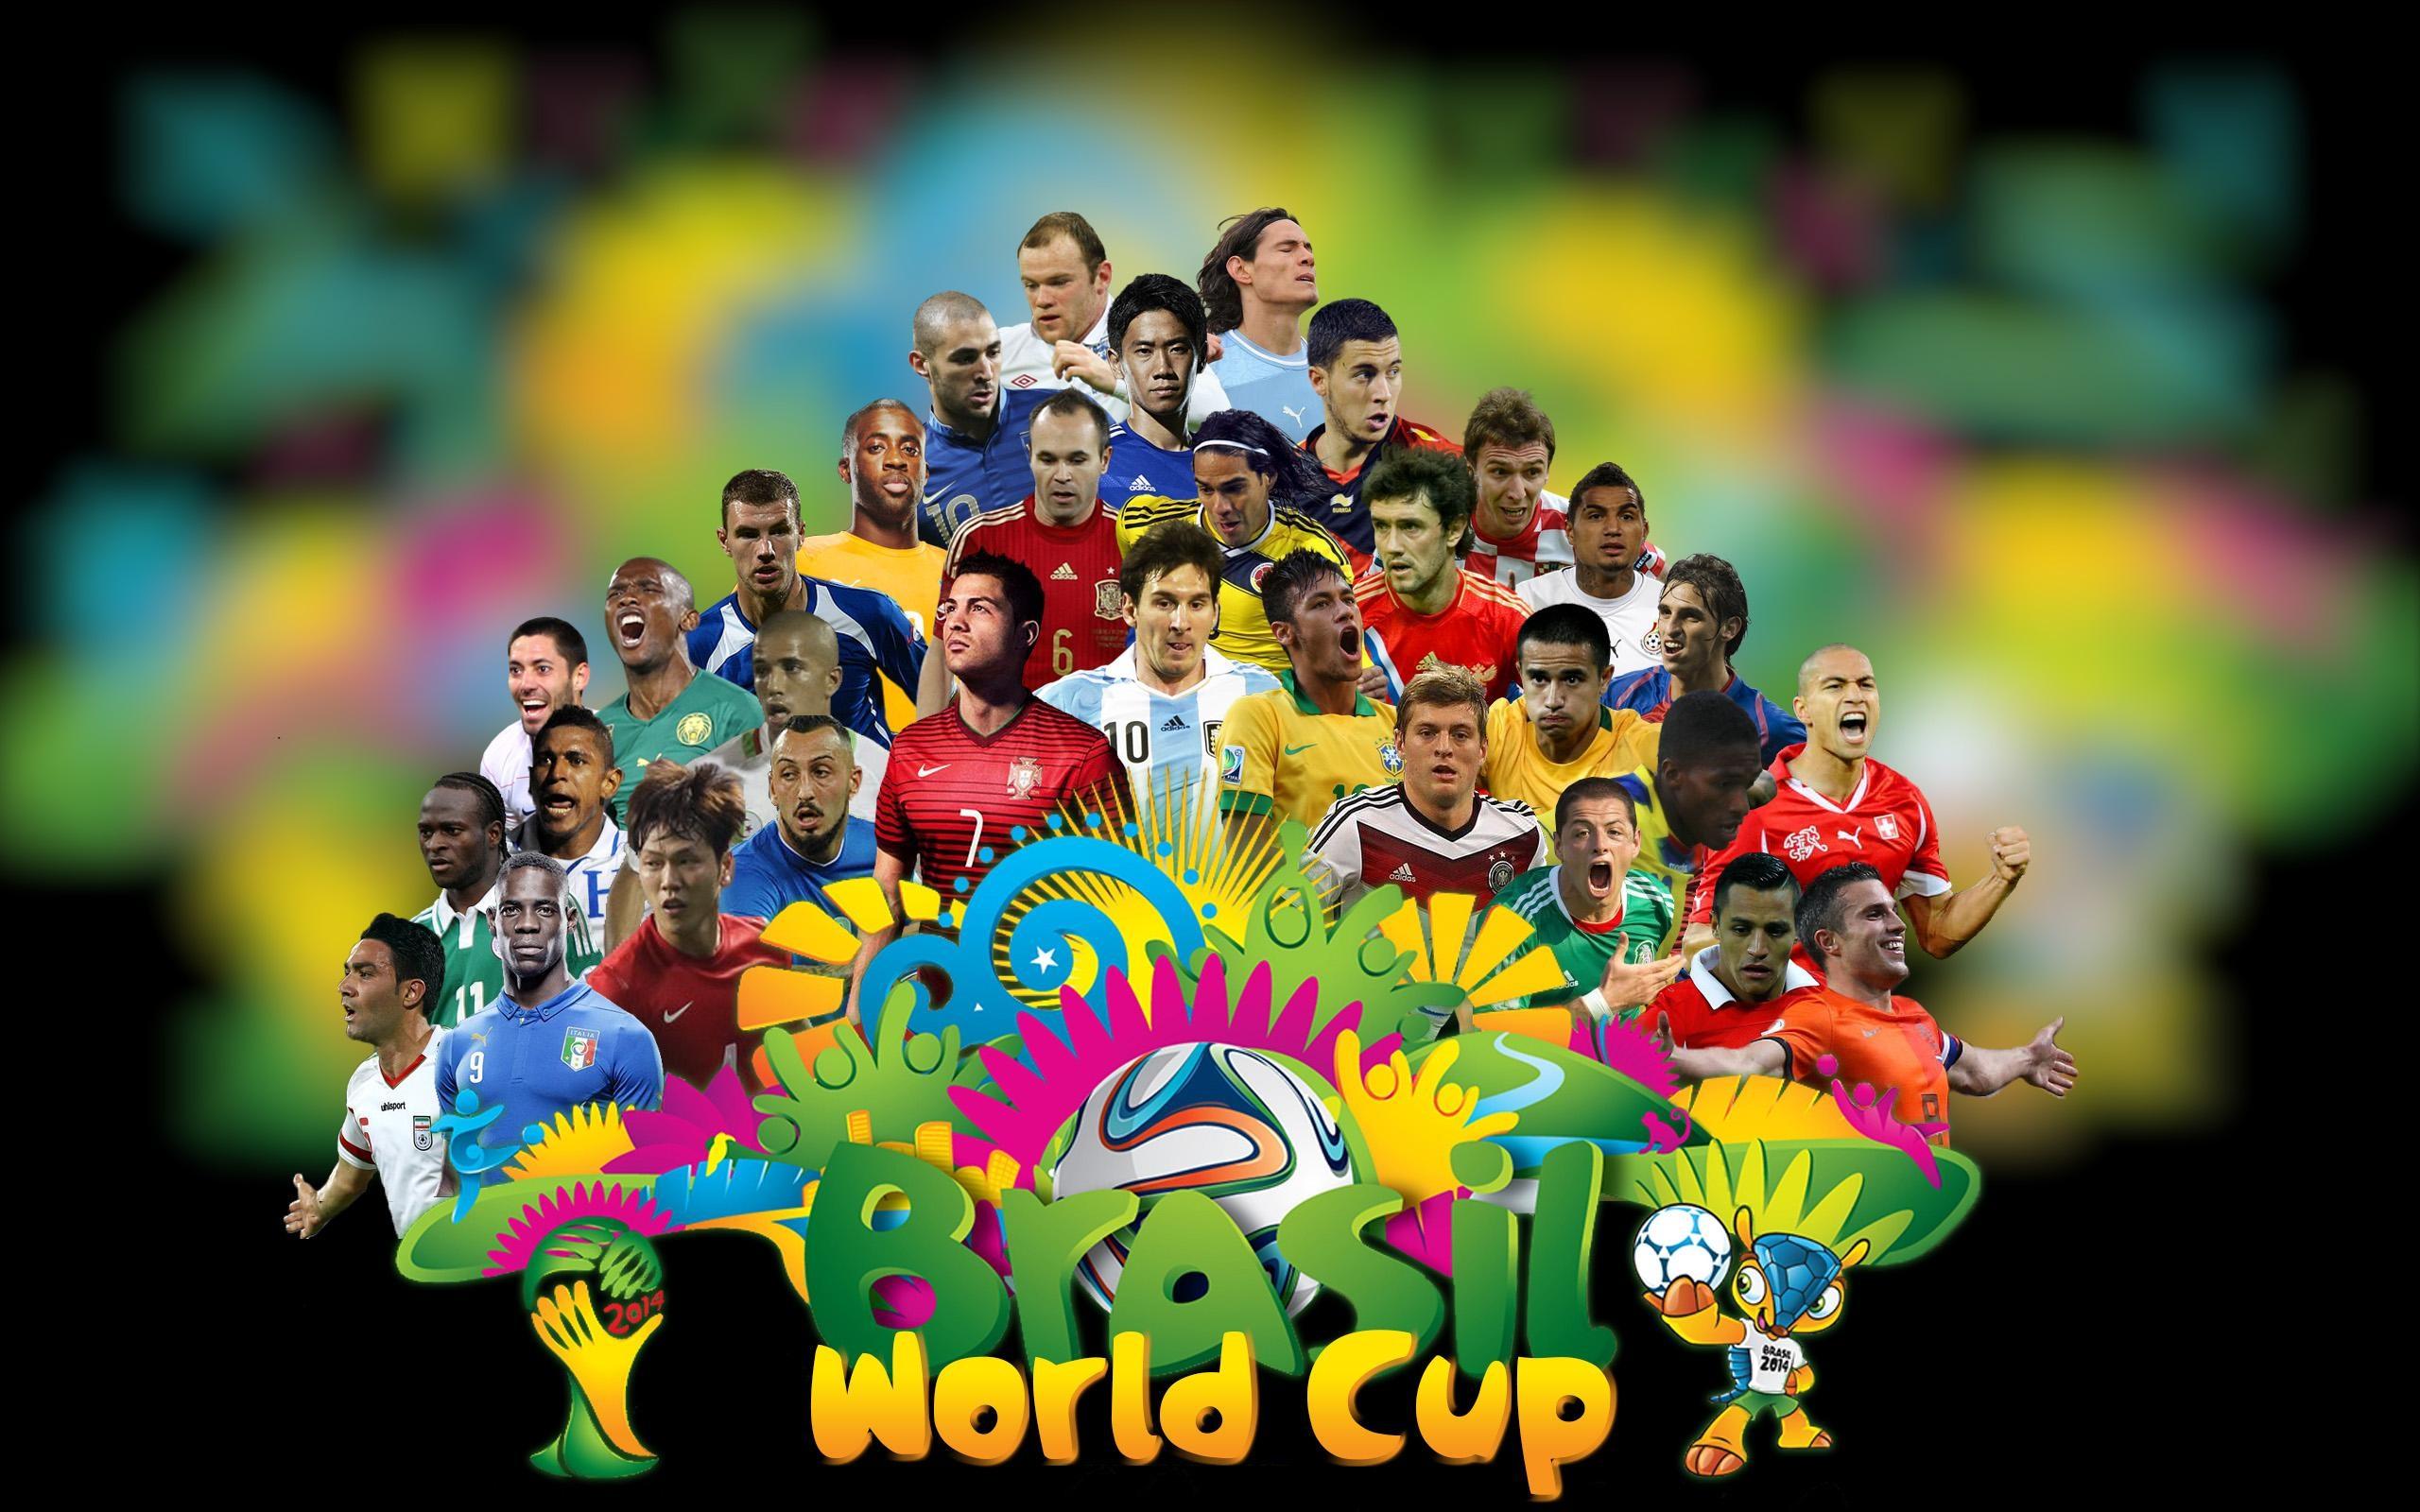 2014 fifa world cup wallpapers digital hd photos